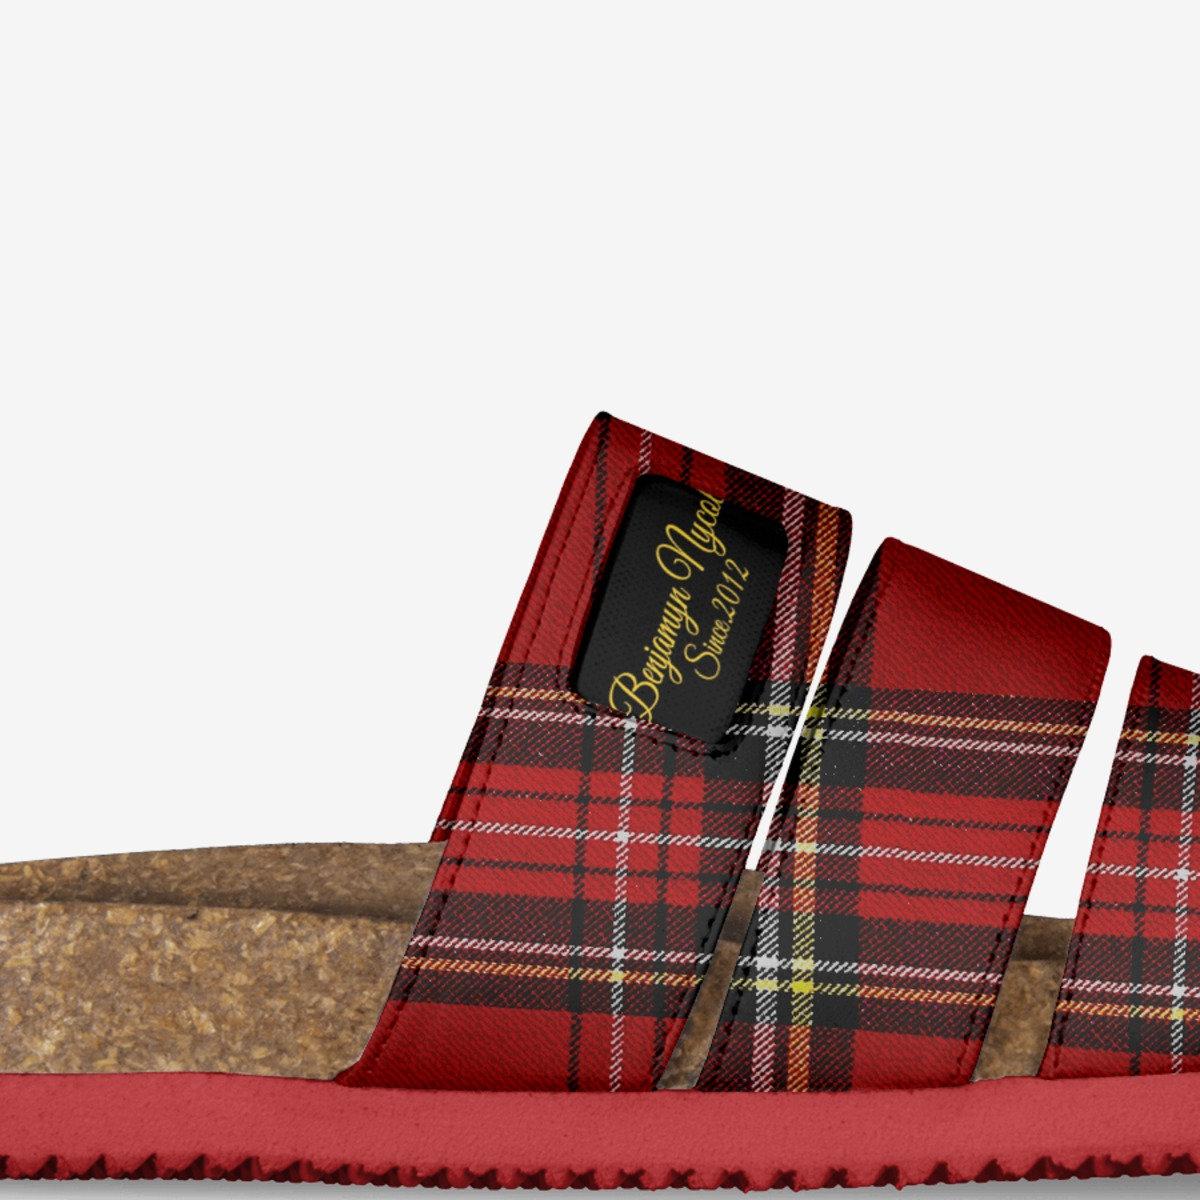 BENJ-shoes-detail.jpg